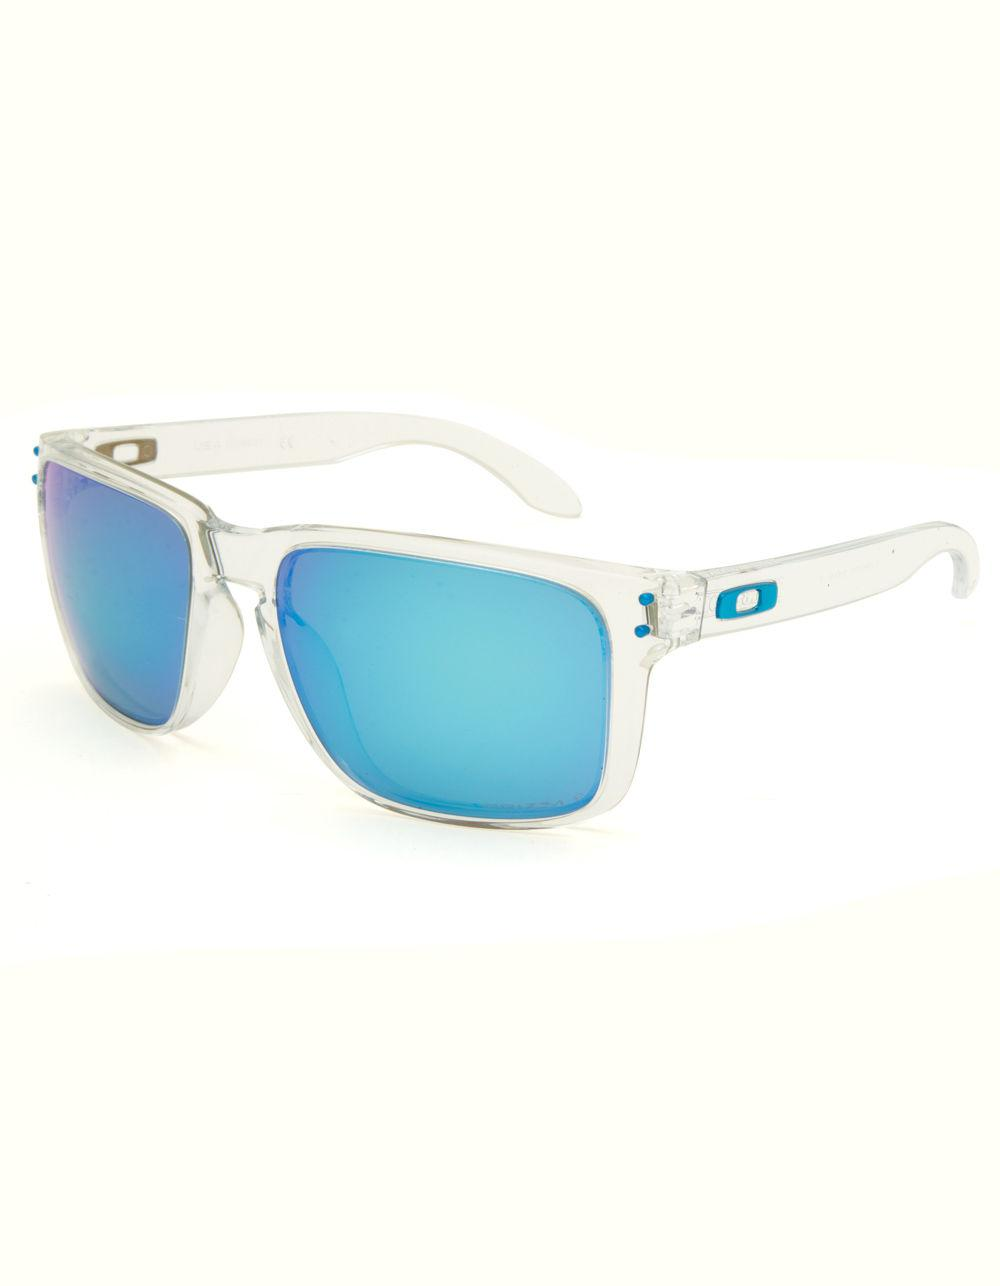 4ffedf25508 Lyst - Oakley Holbrook Xl Clear   Blue Sunglasses in Blue for Men